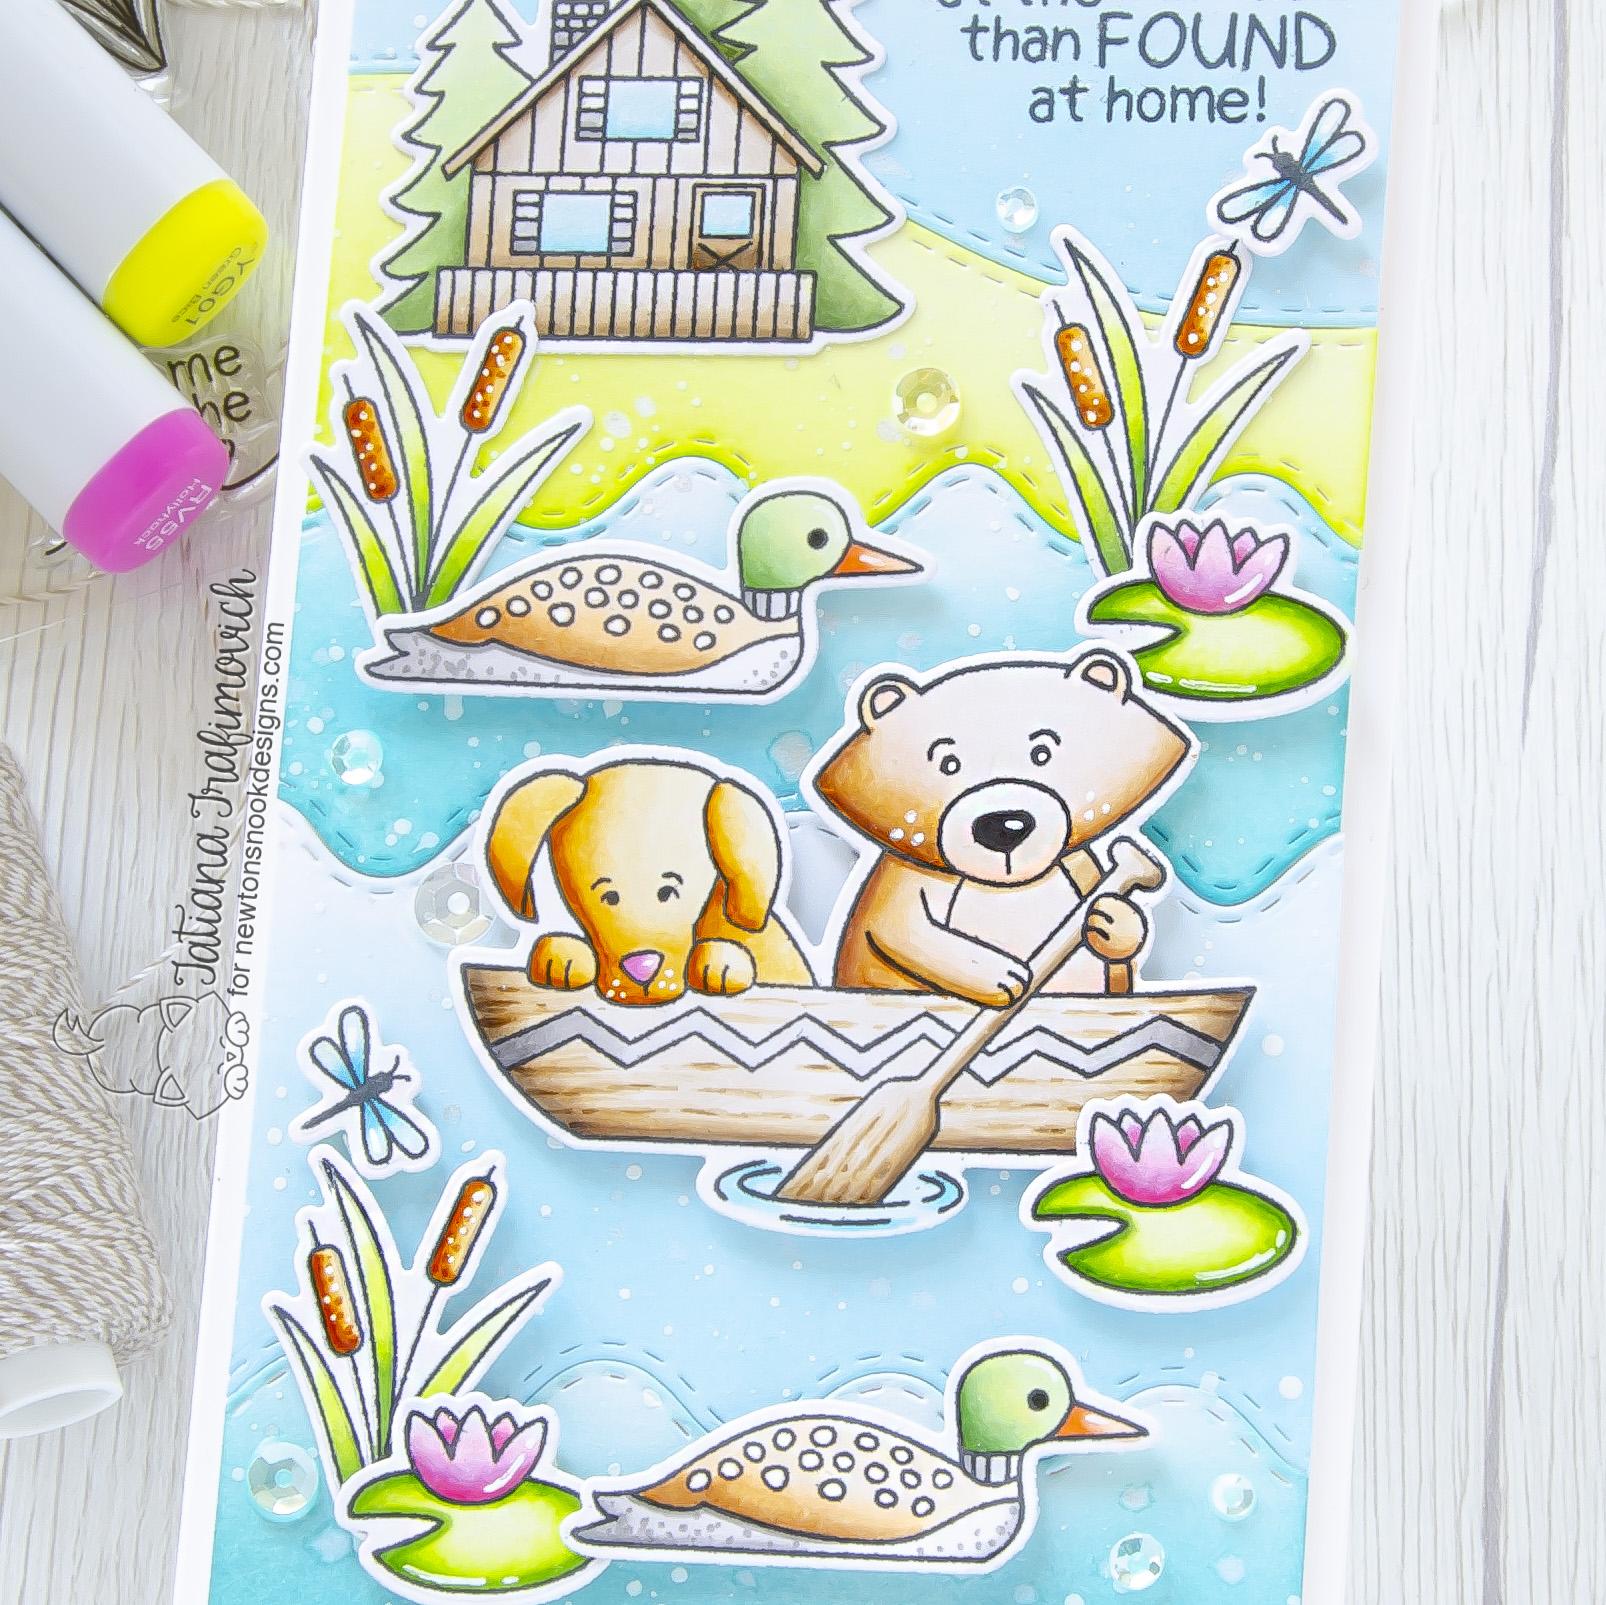 I'd Rather Be Lost At The Lake... #handmade card by Tatiana Trafimovich #tatianacraftandart - Winston's Lake House stamp set by Newton's Nook Designs #newtonsnook